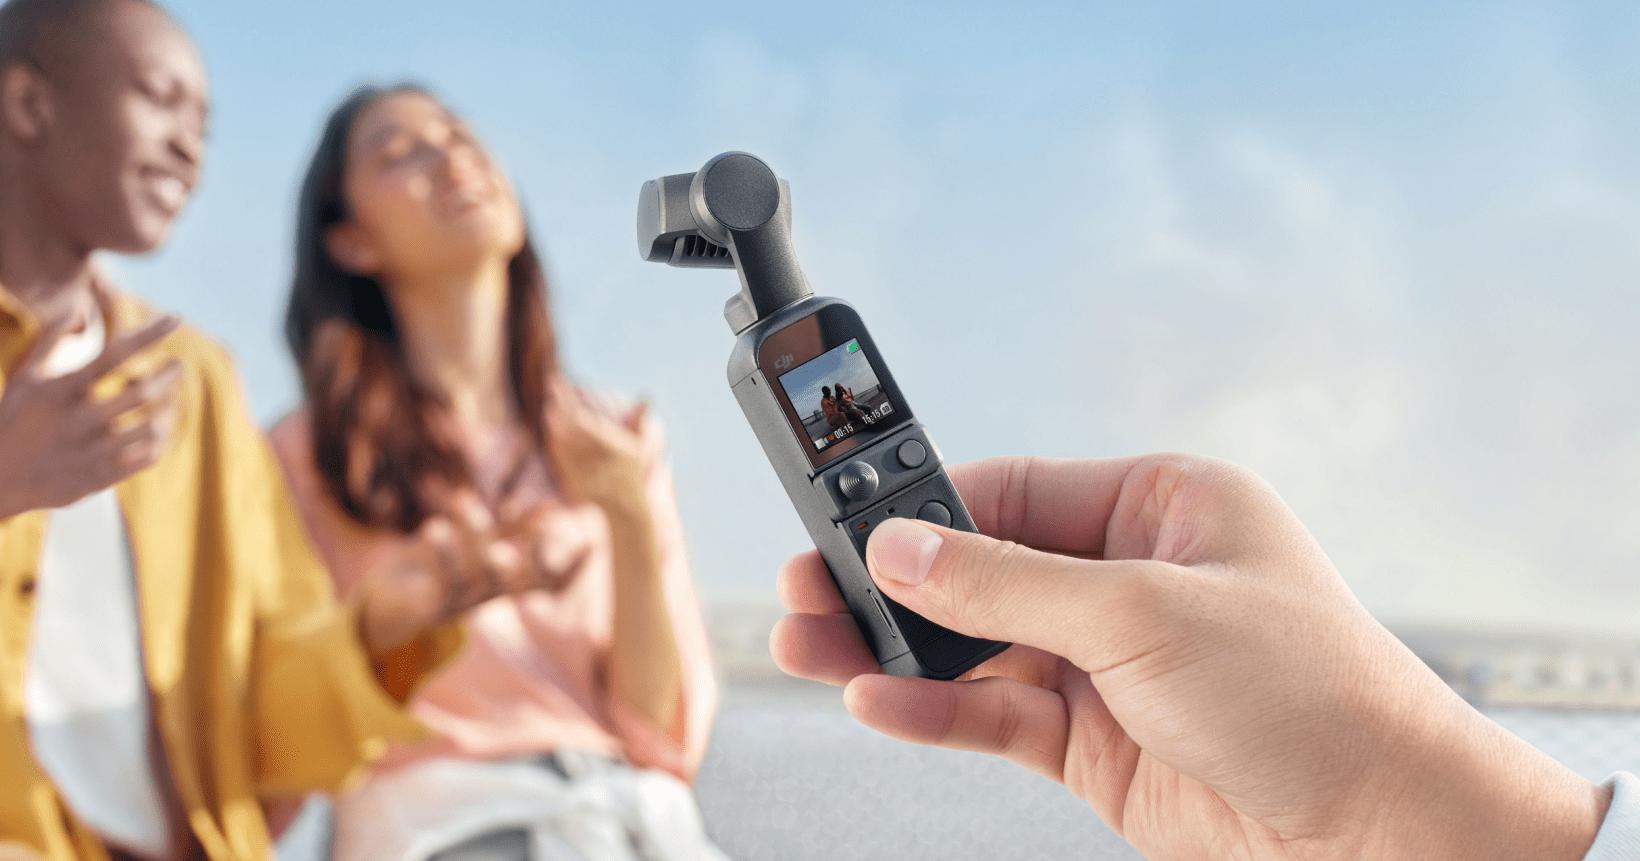 DJI's new Pocket 2 brings big updates to a little camera